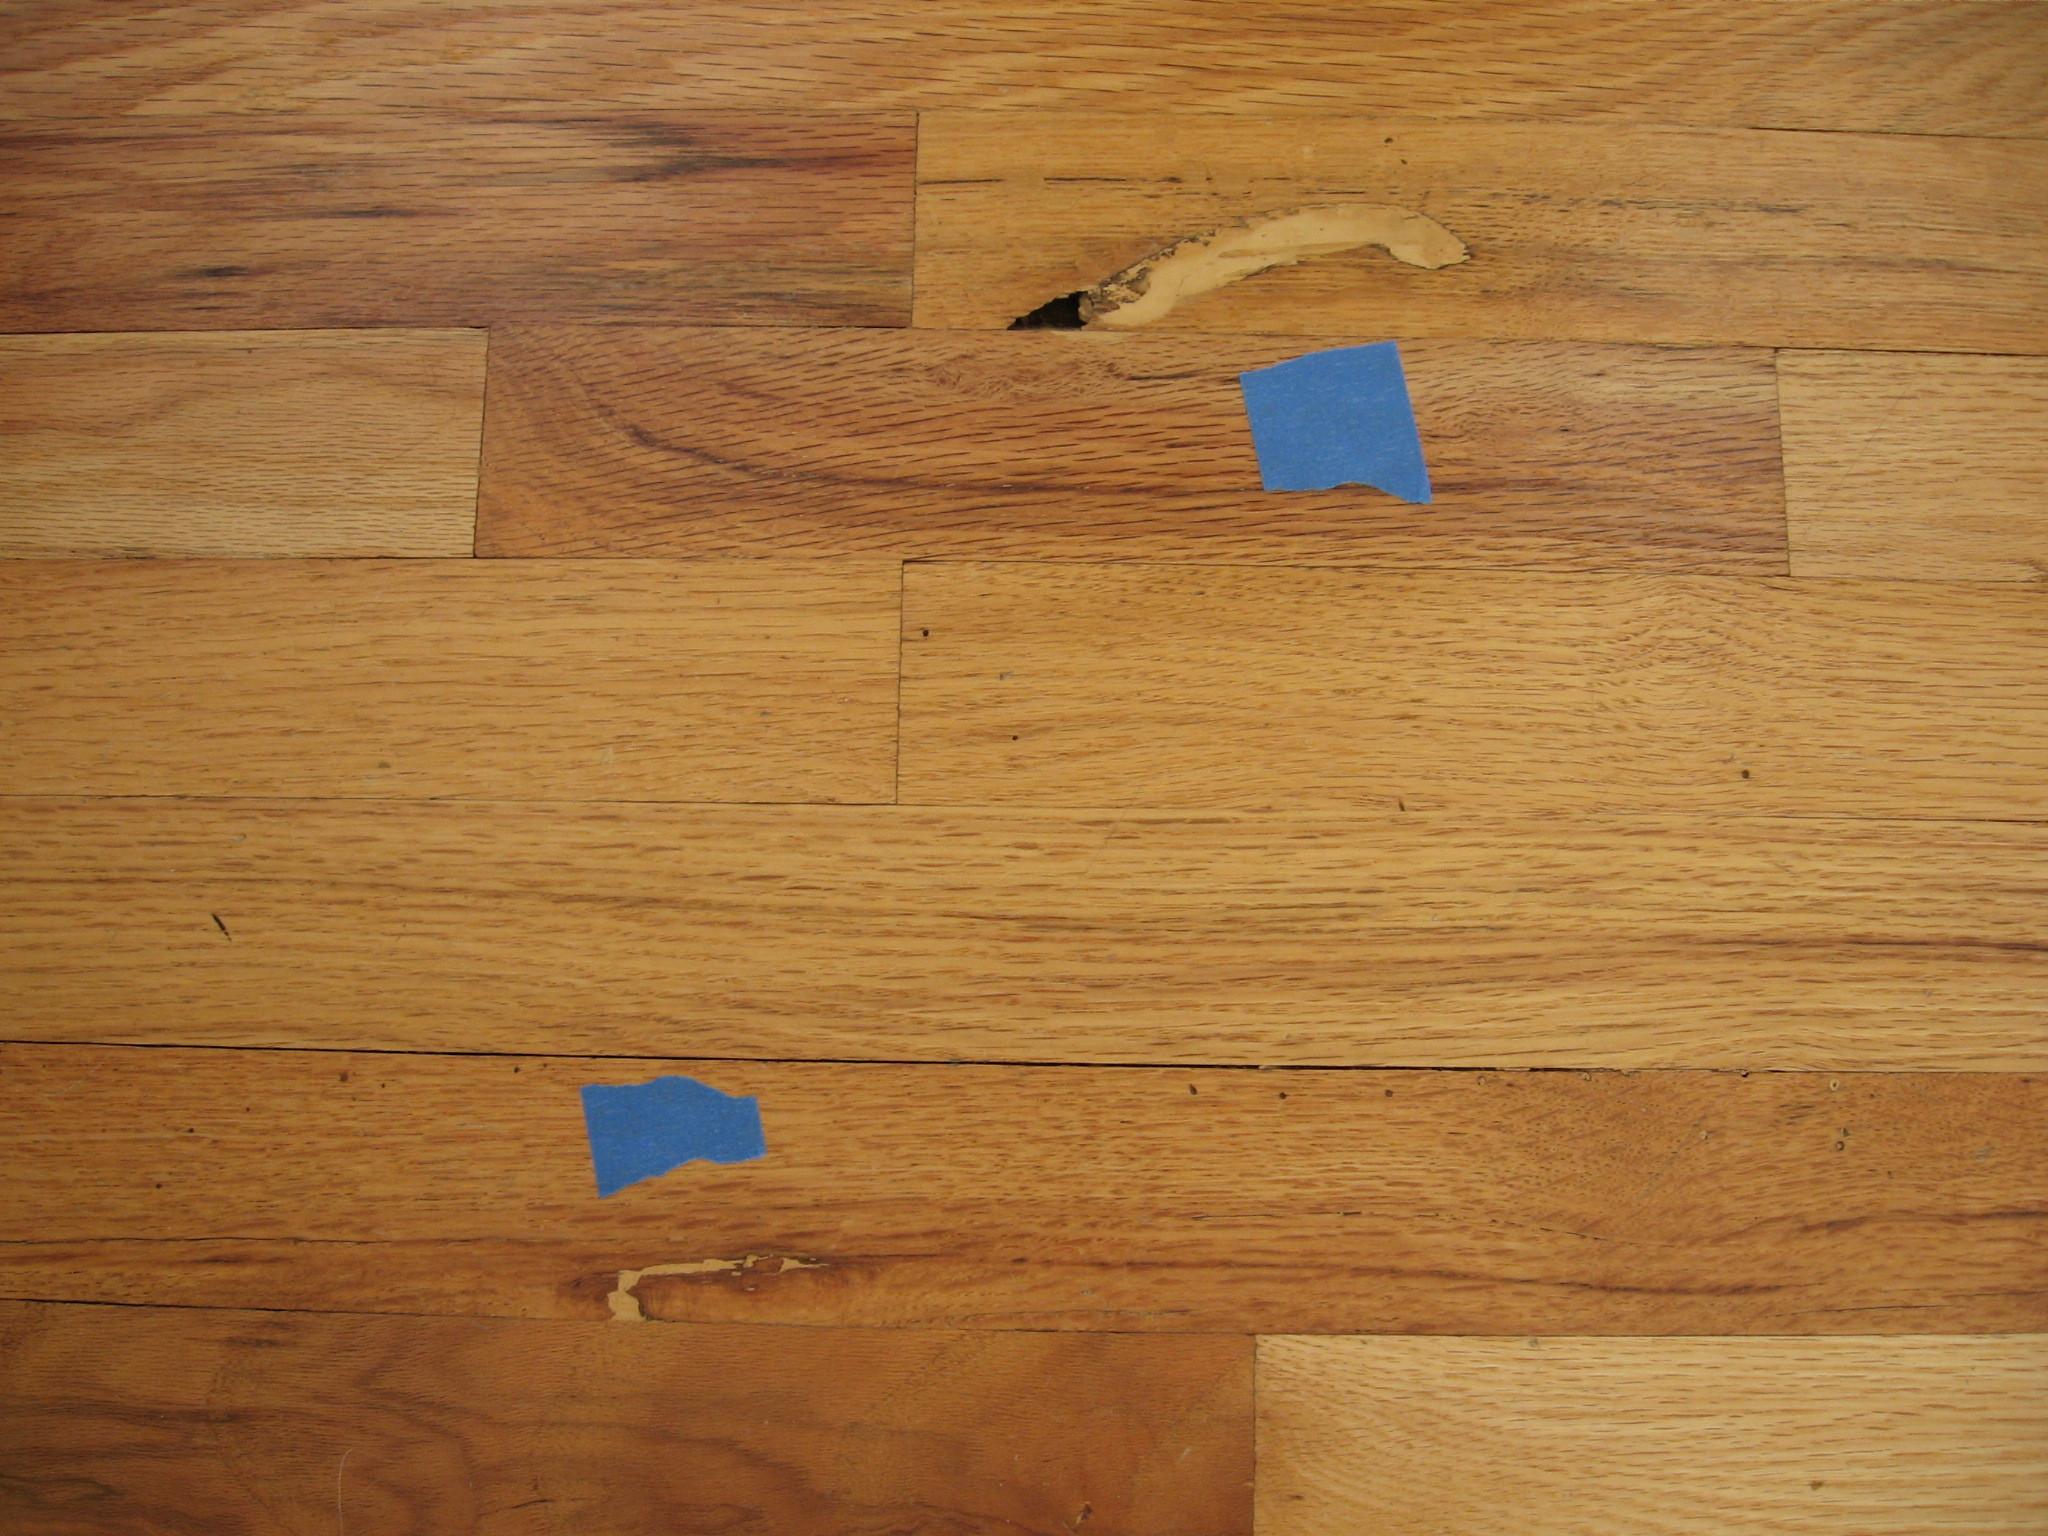 hardwood floor care system of wood floor techniques 101 for filler bad